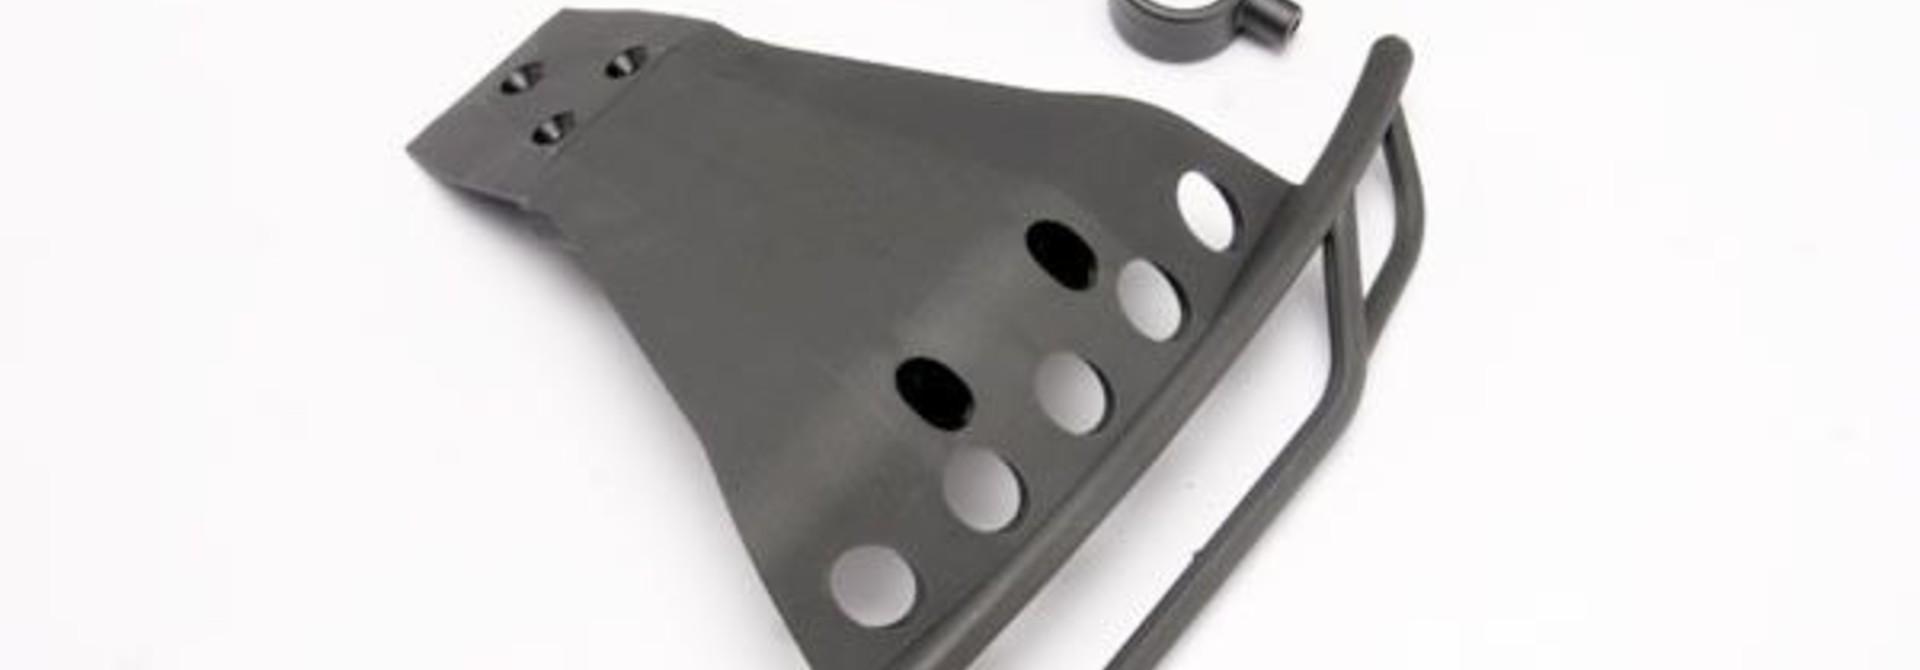 Bumper, front/ bumper mount, front (black), TRX6835